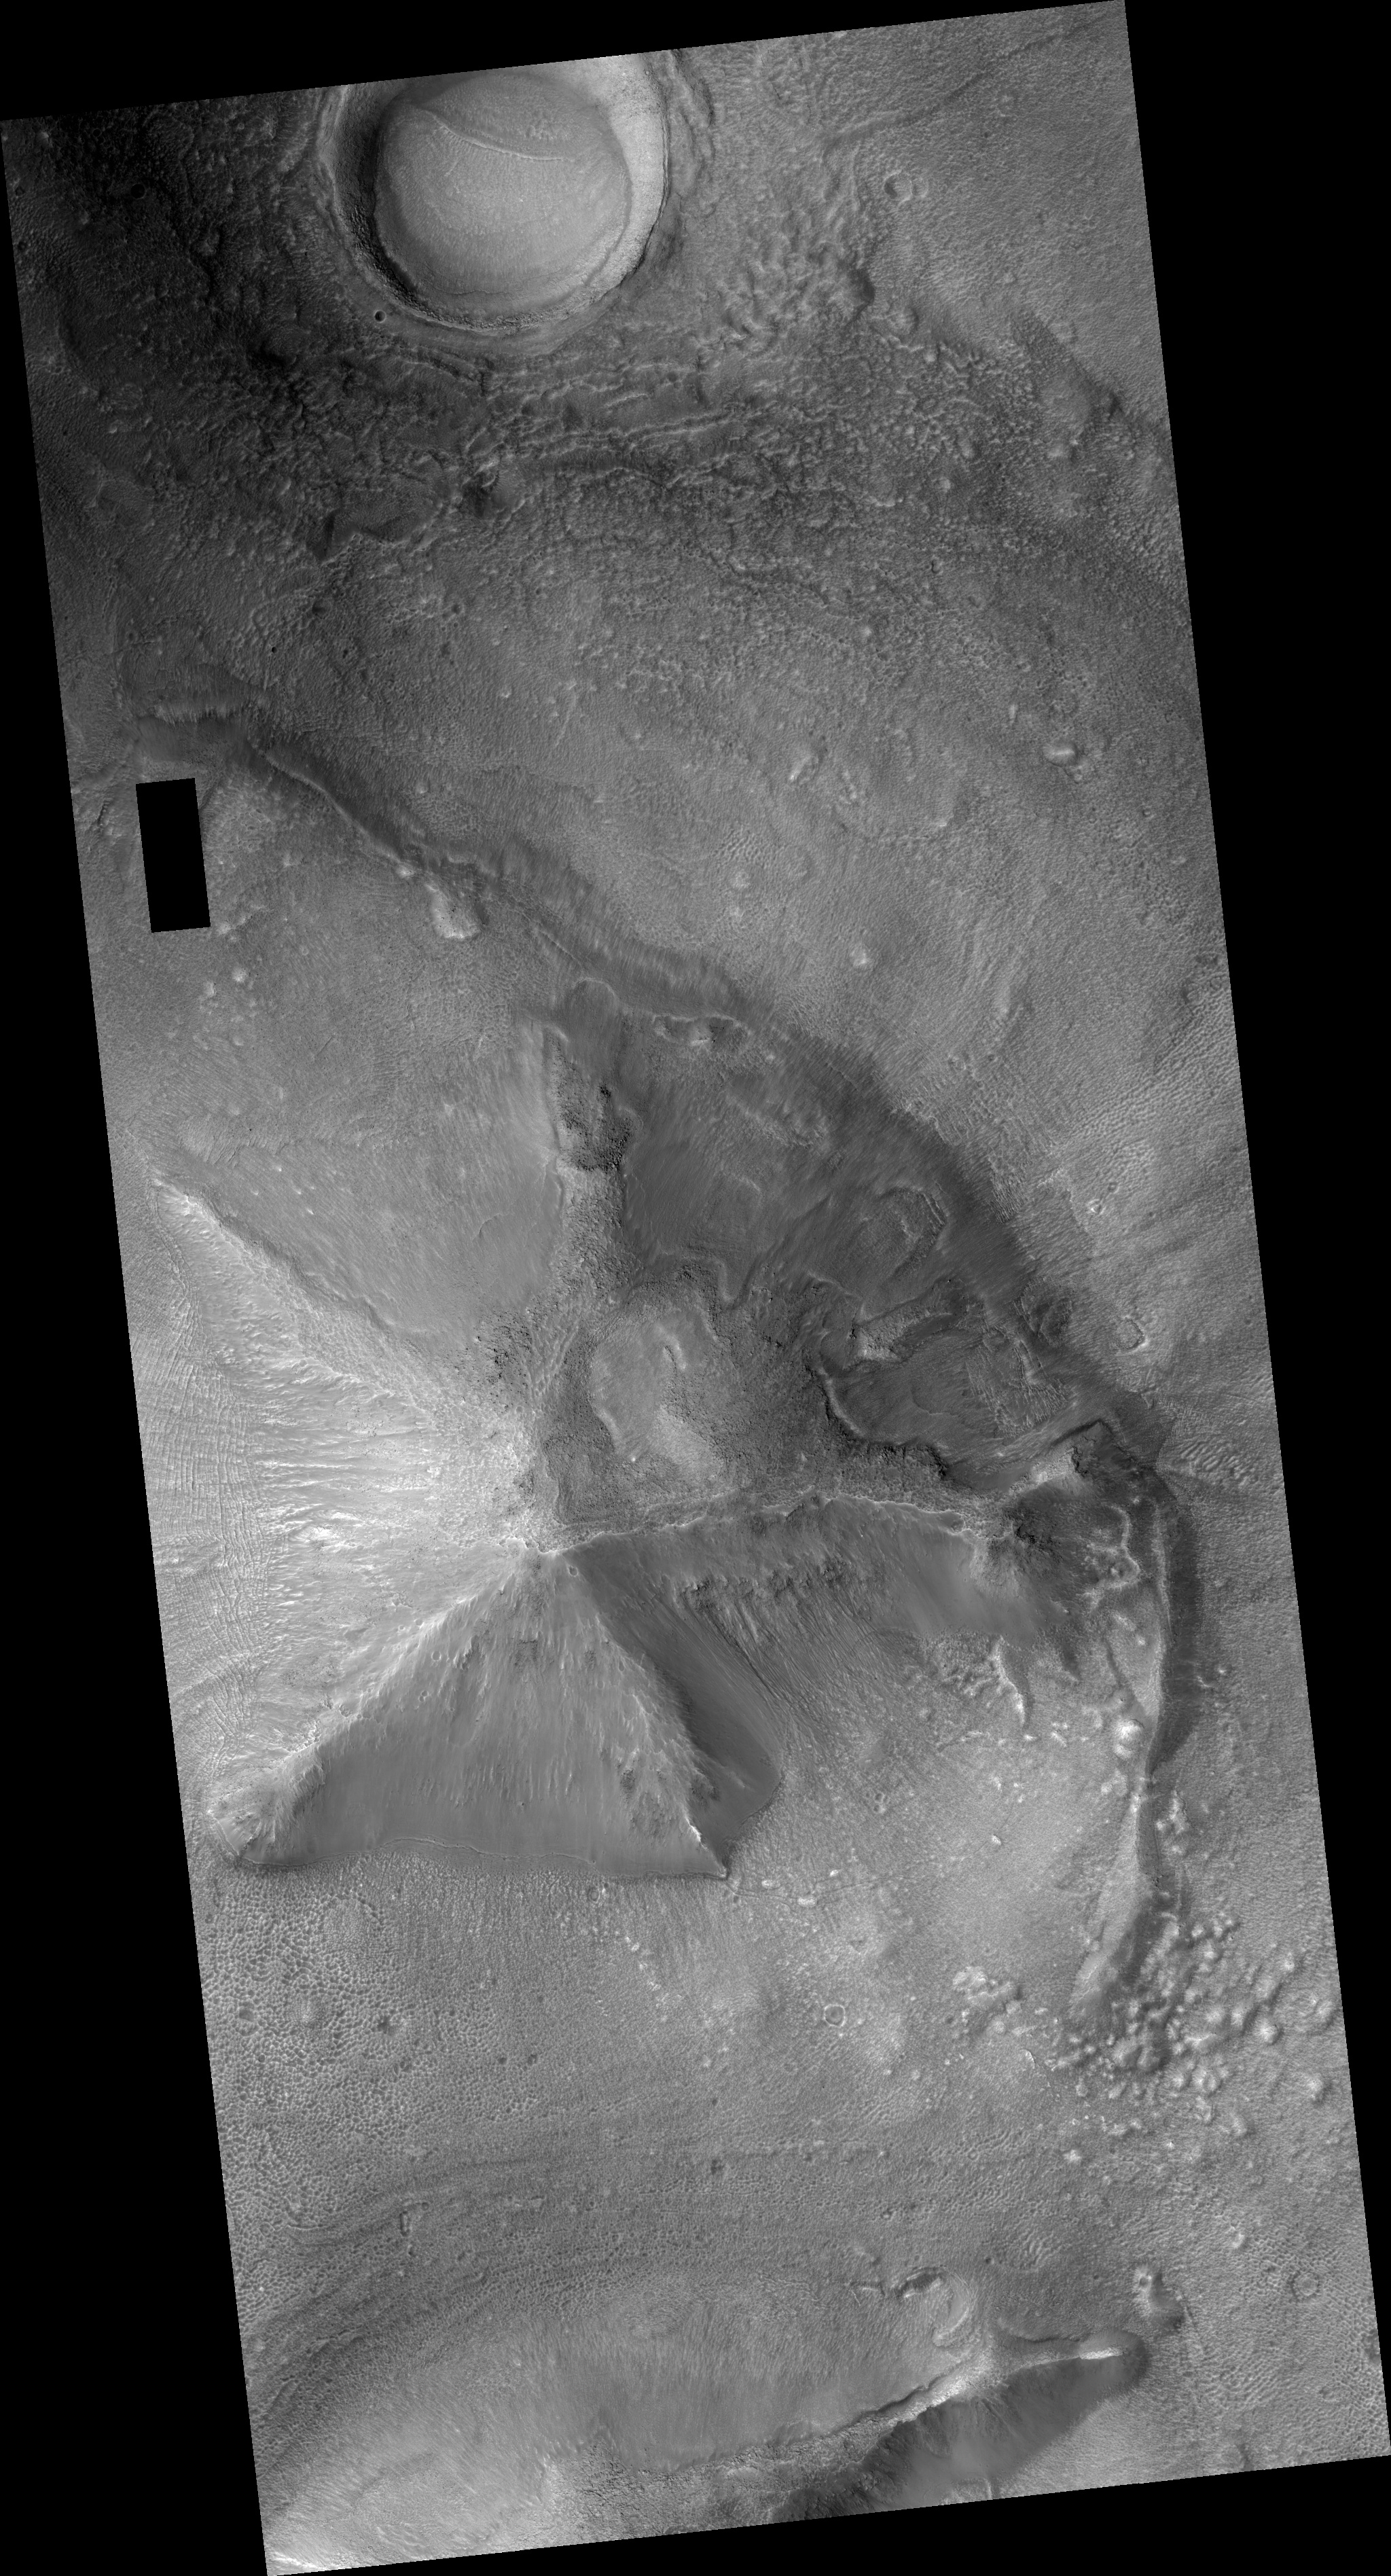 HiRISE.